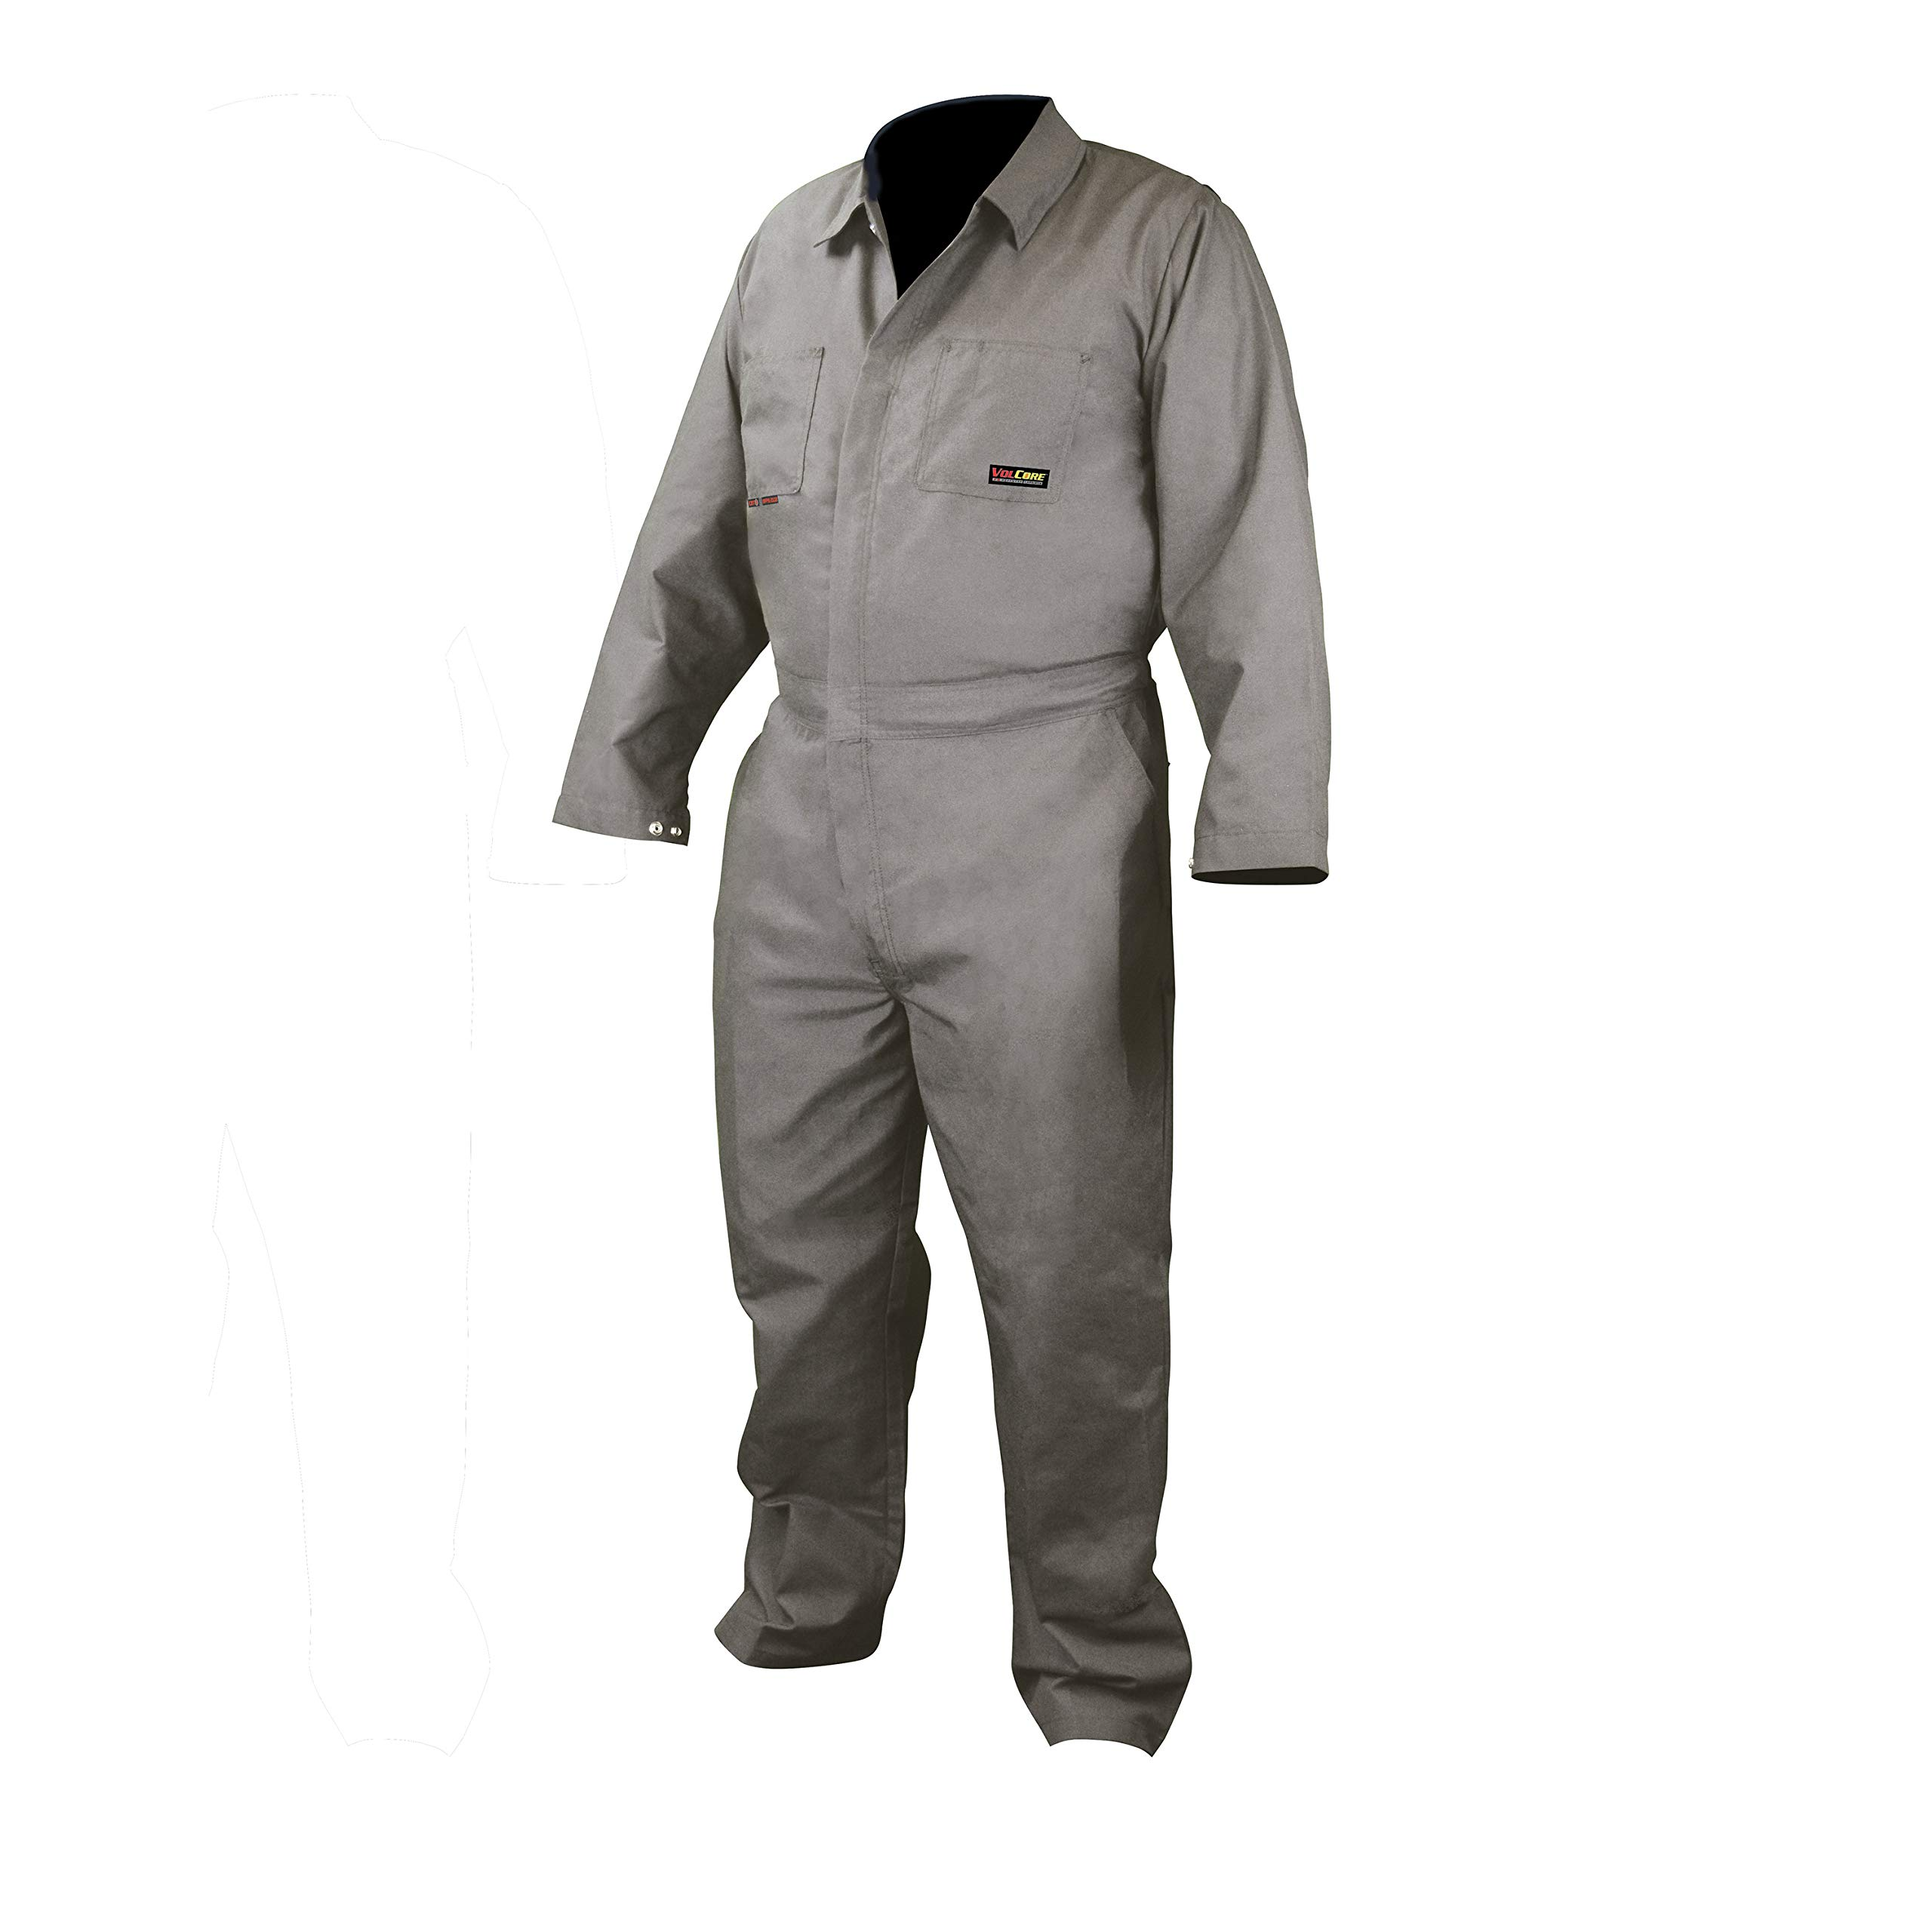 FRCA-002 VolCore Cotton FR Coverall